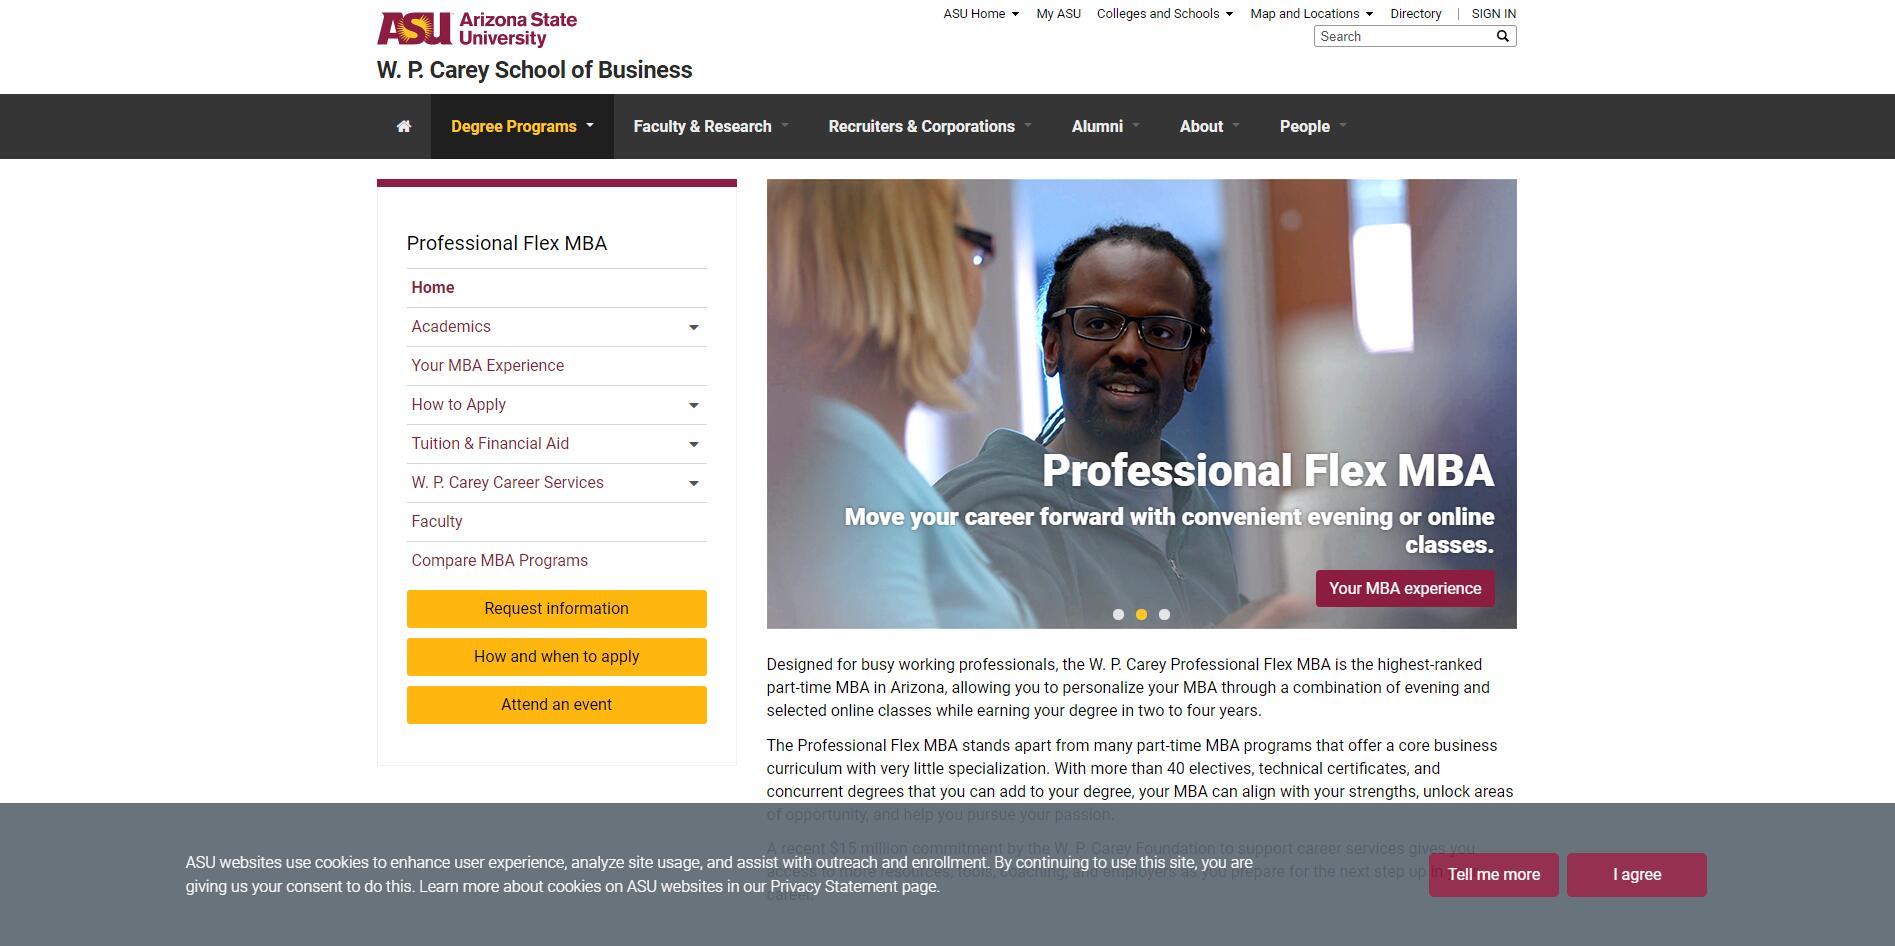 Top Part-time MBA Programs in Arizona